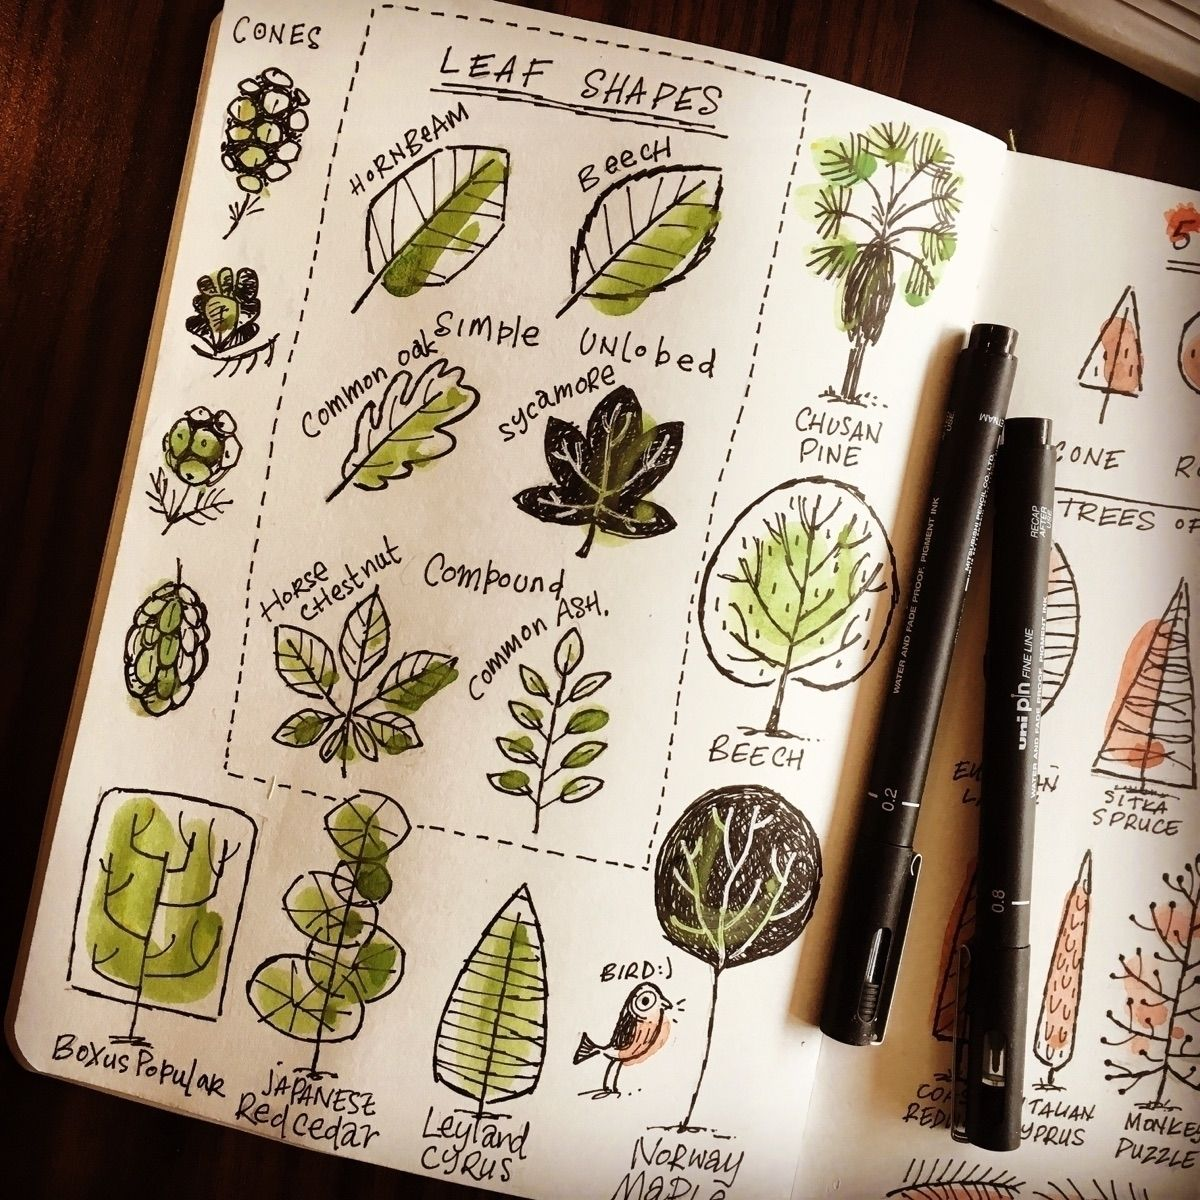 Trees pt2 leaf shapes sketchbook stevesimpson in